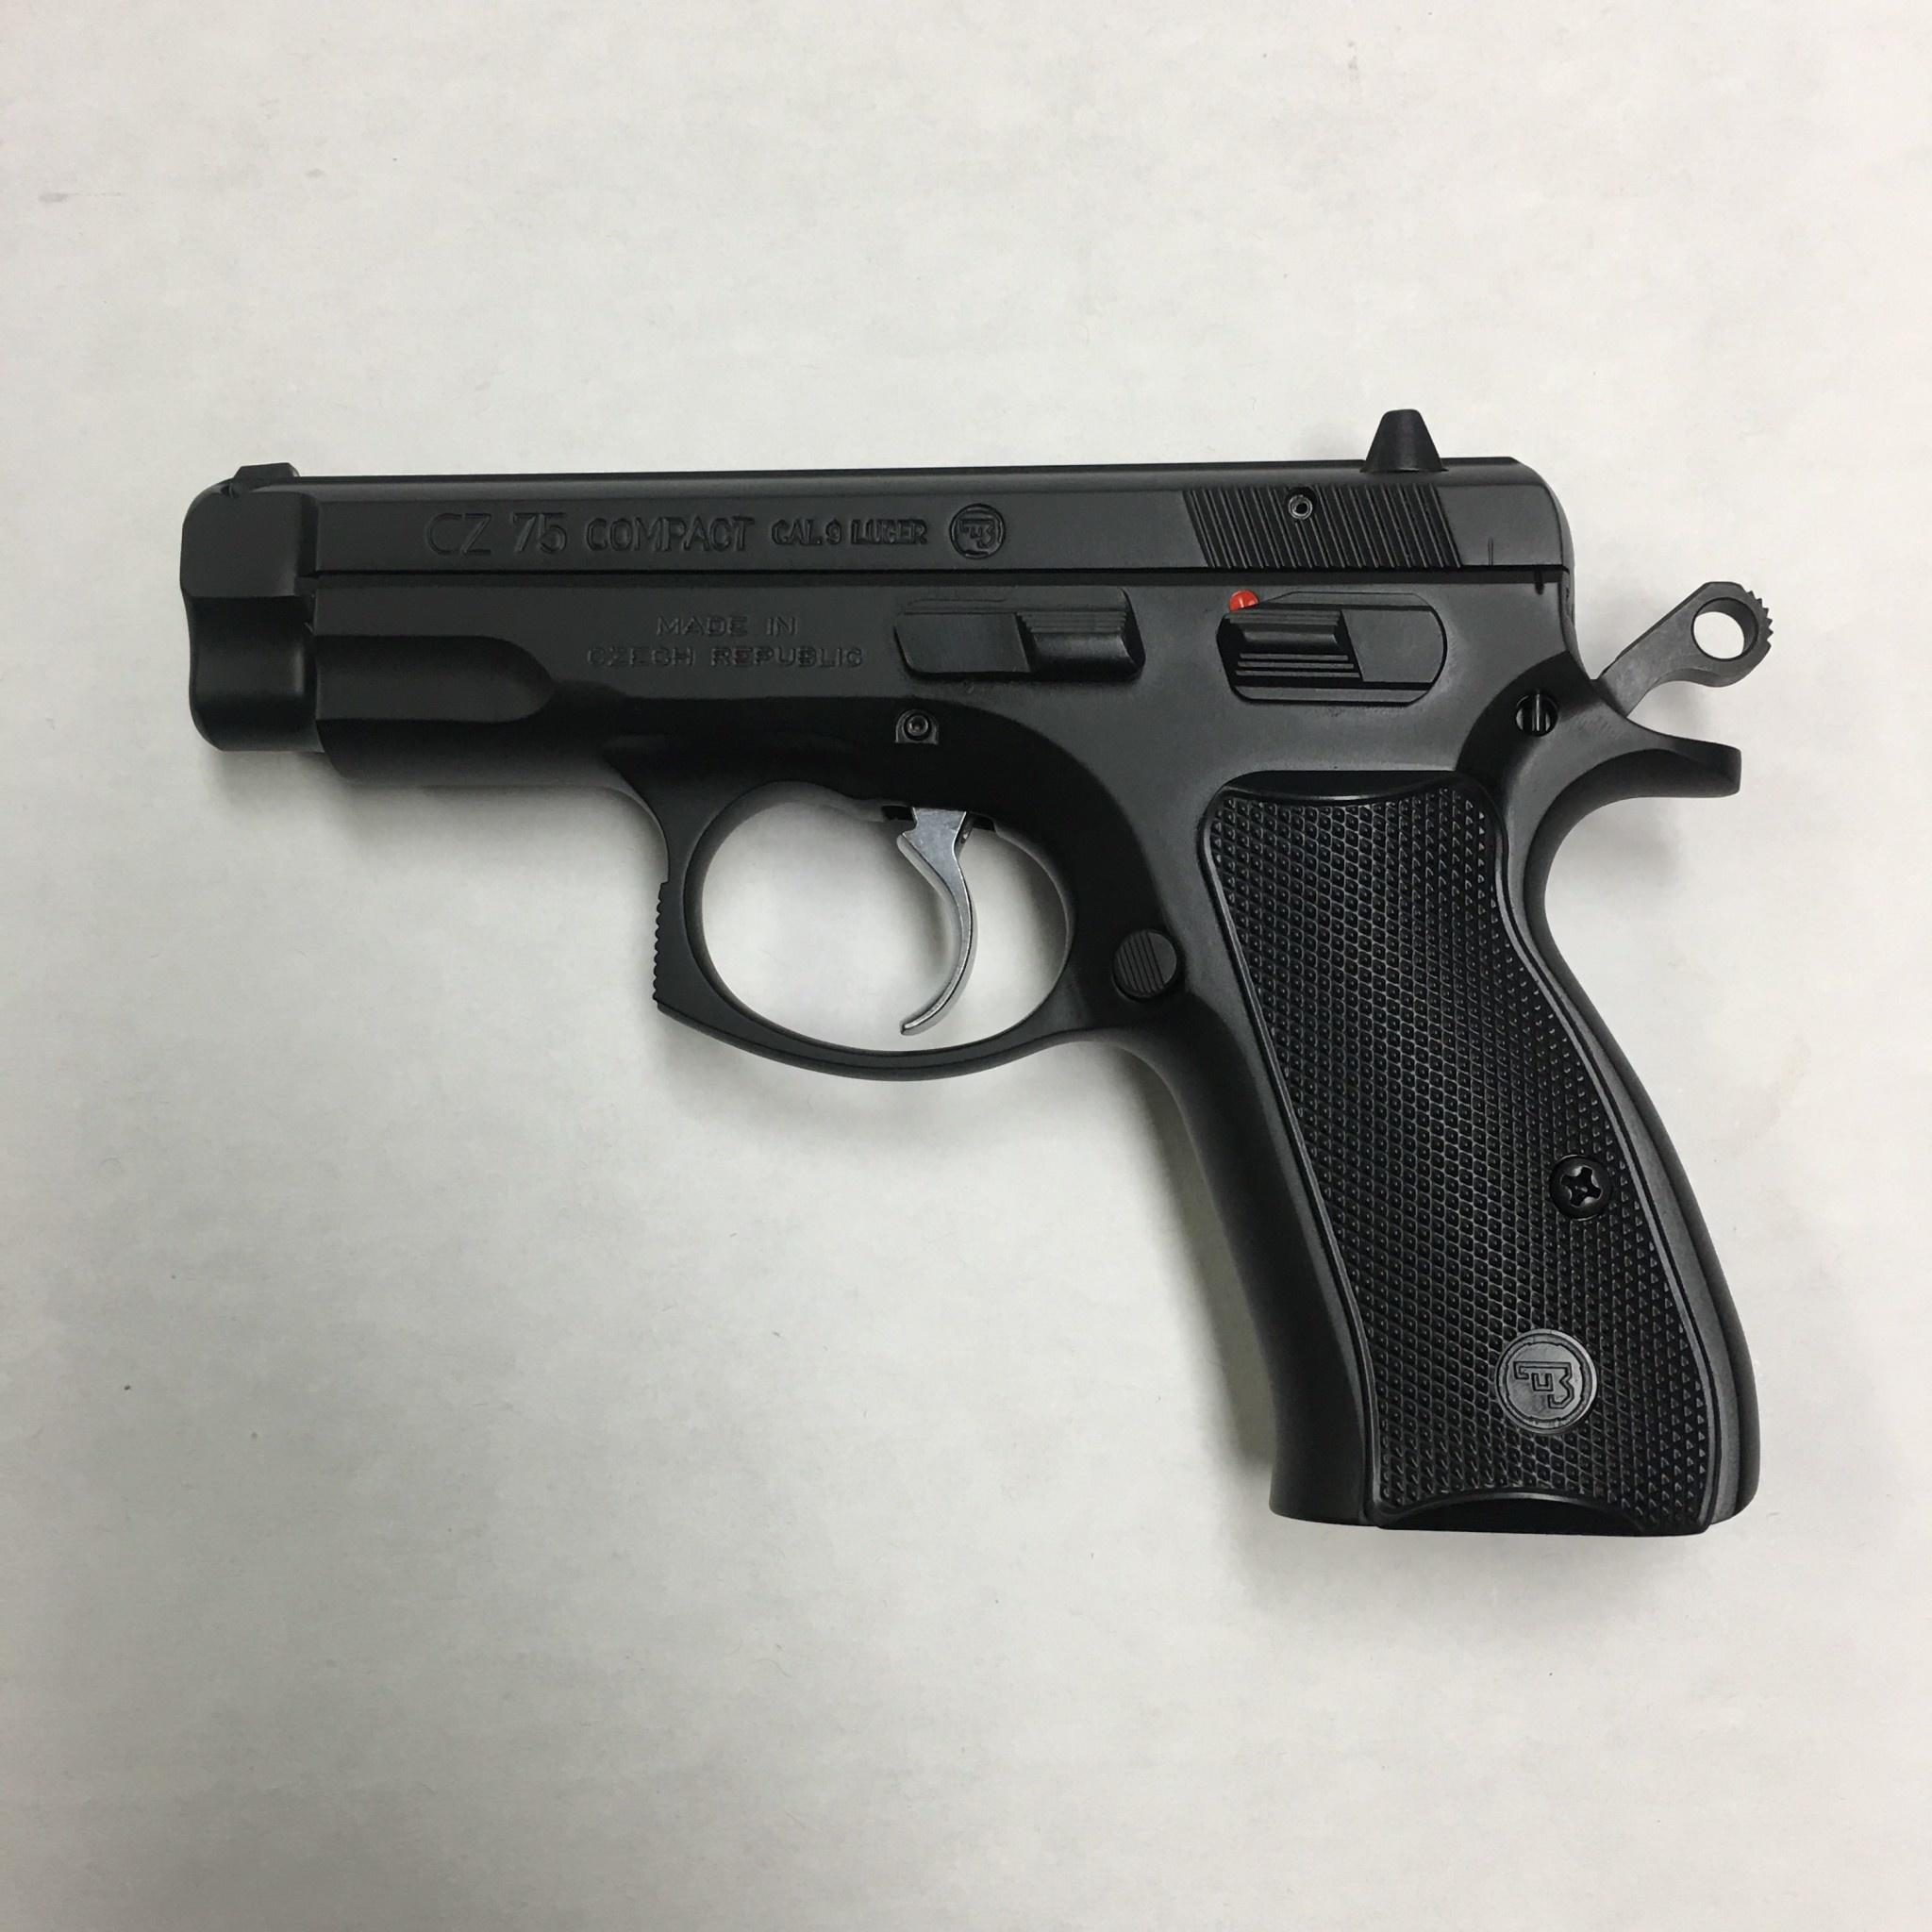 CZ-USA 75 Compact Pistol 9MM